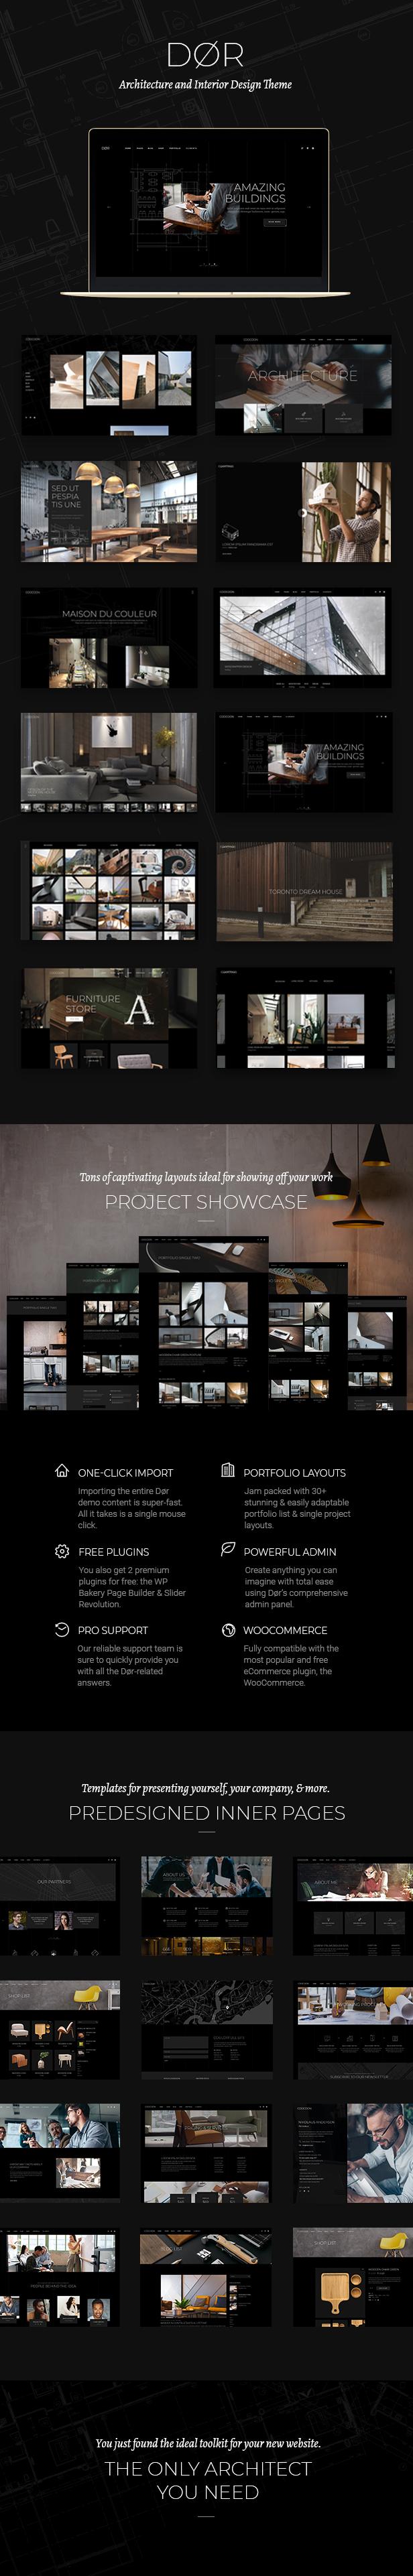 Dør - Modern Architecture and Interior Design Theme - 1